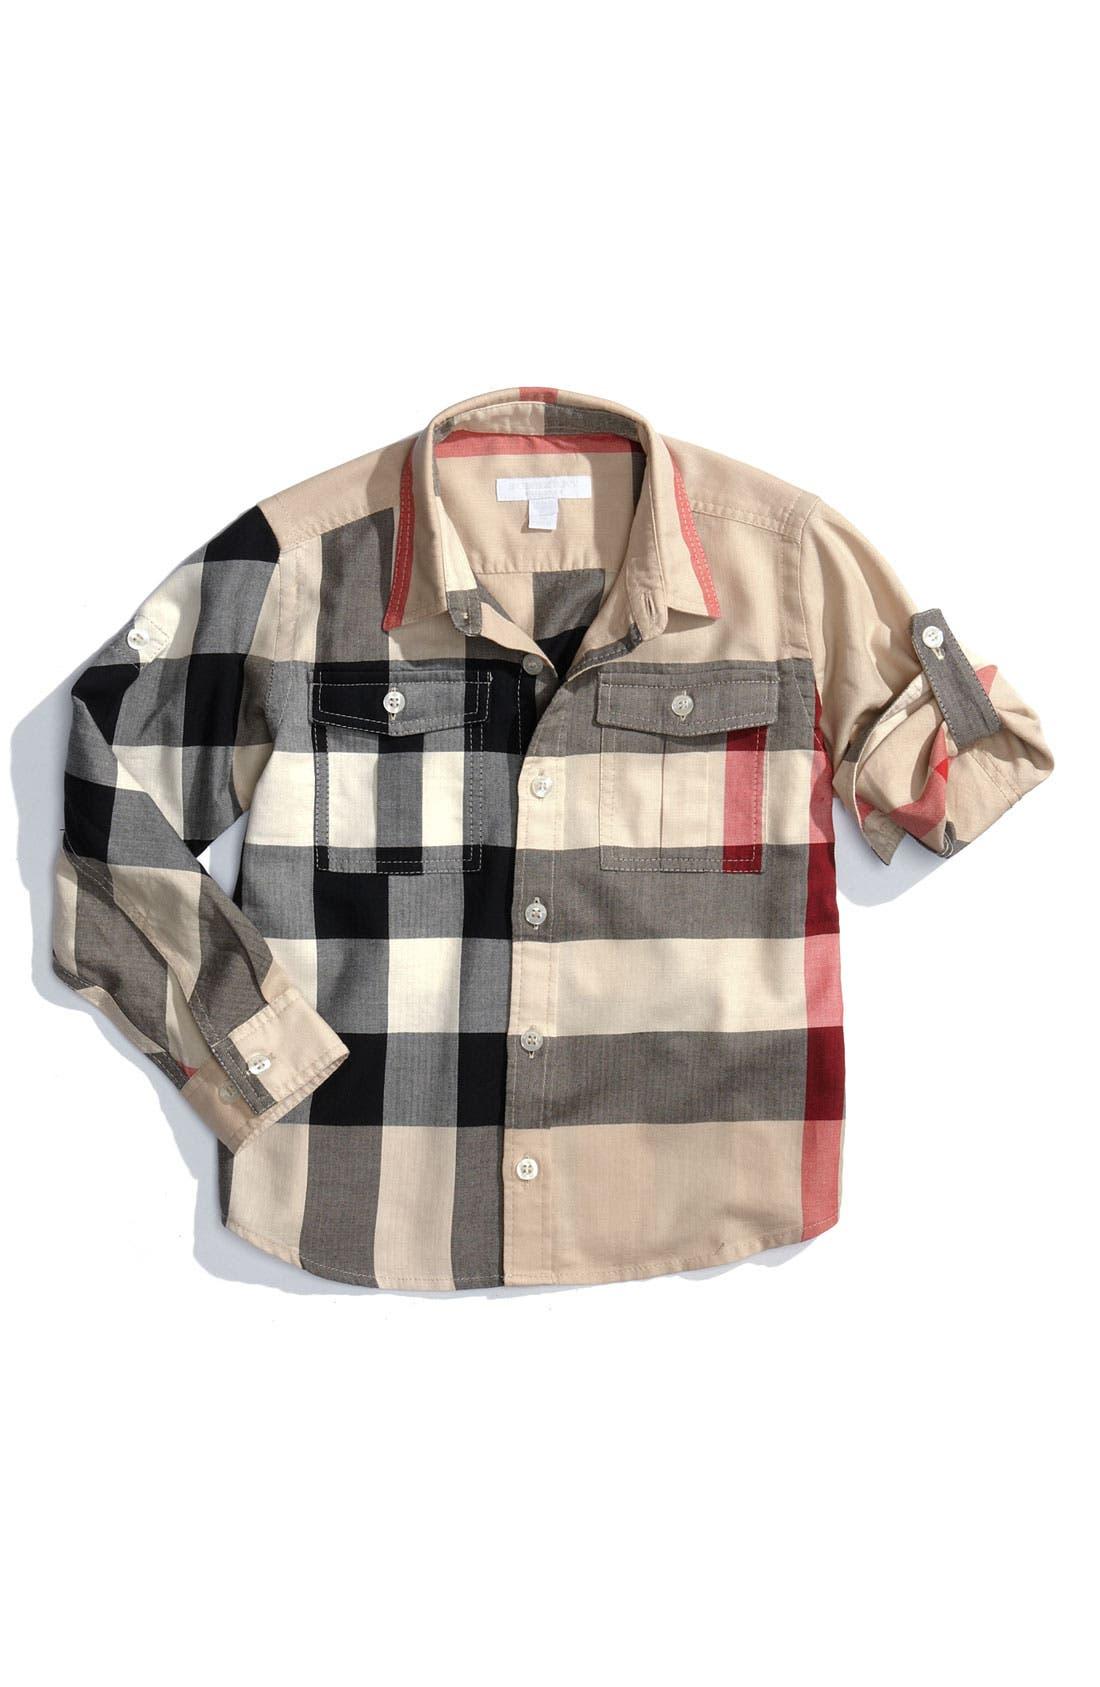 Alternate Image 1 Selected - Burberry Check Print Woven Shirt (Little Boys)